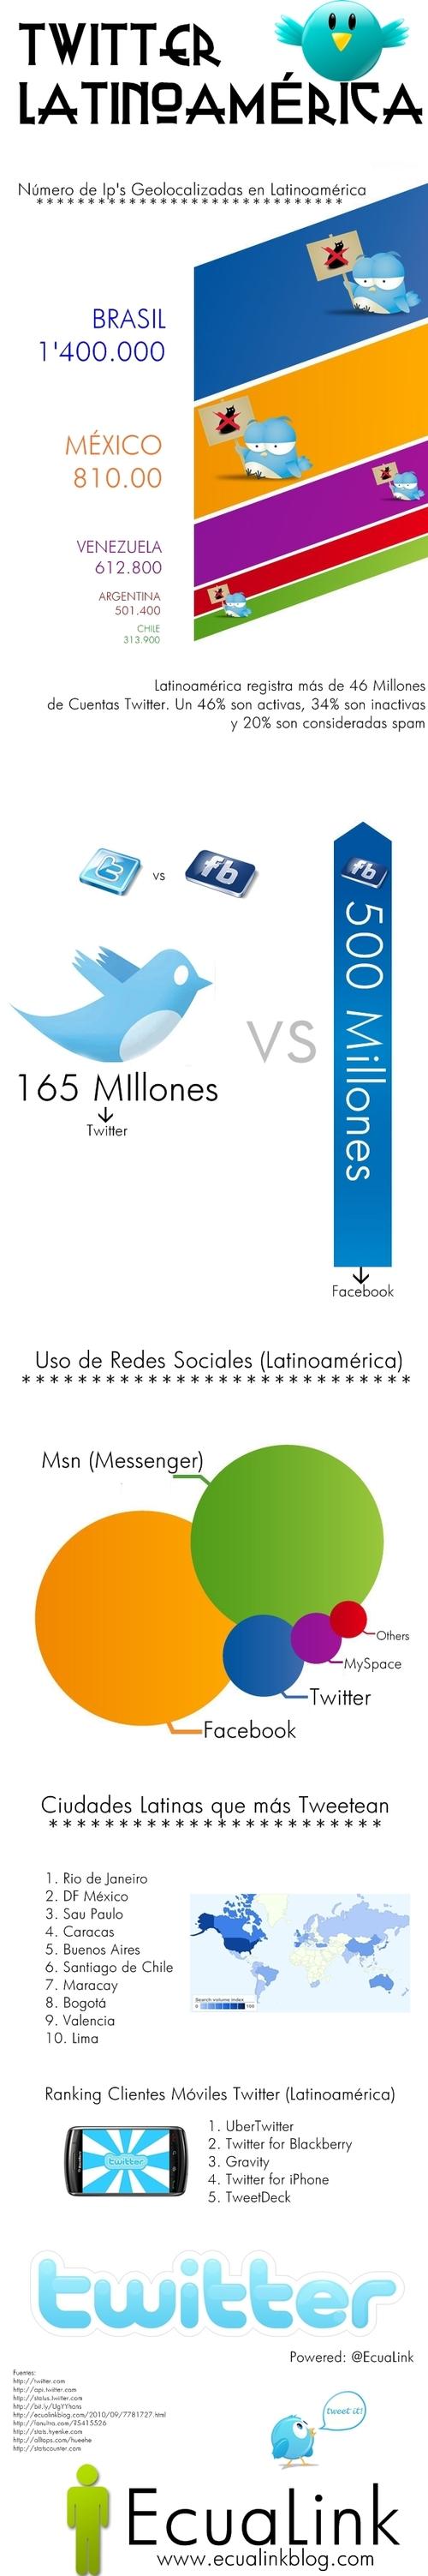 Datos Twitter Latinoamerica (Infografia)